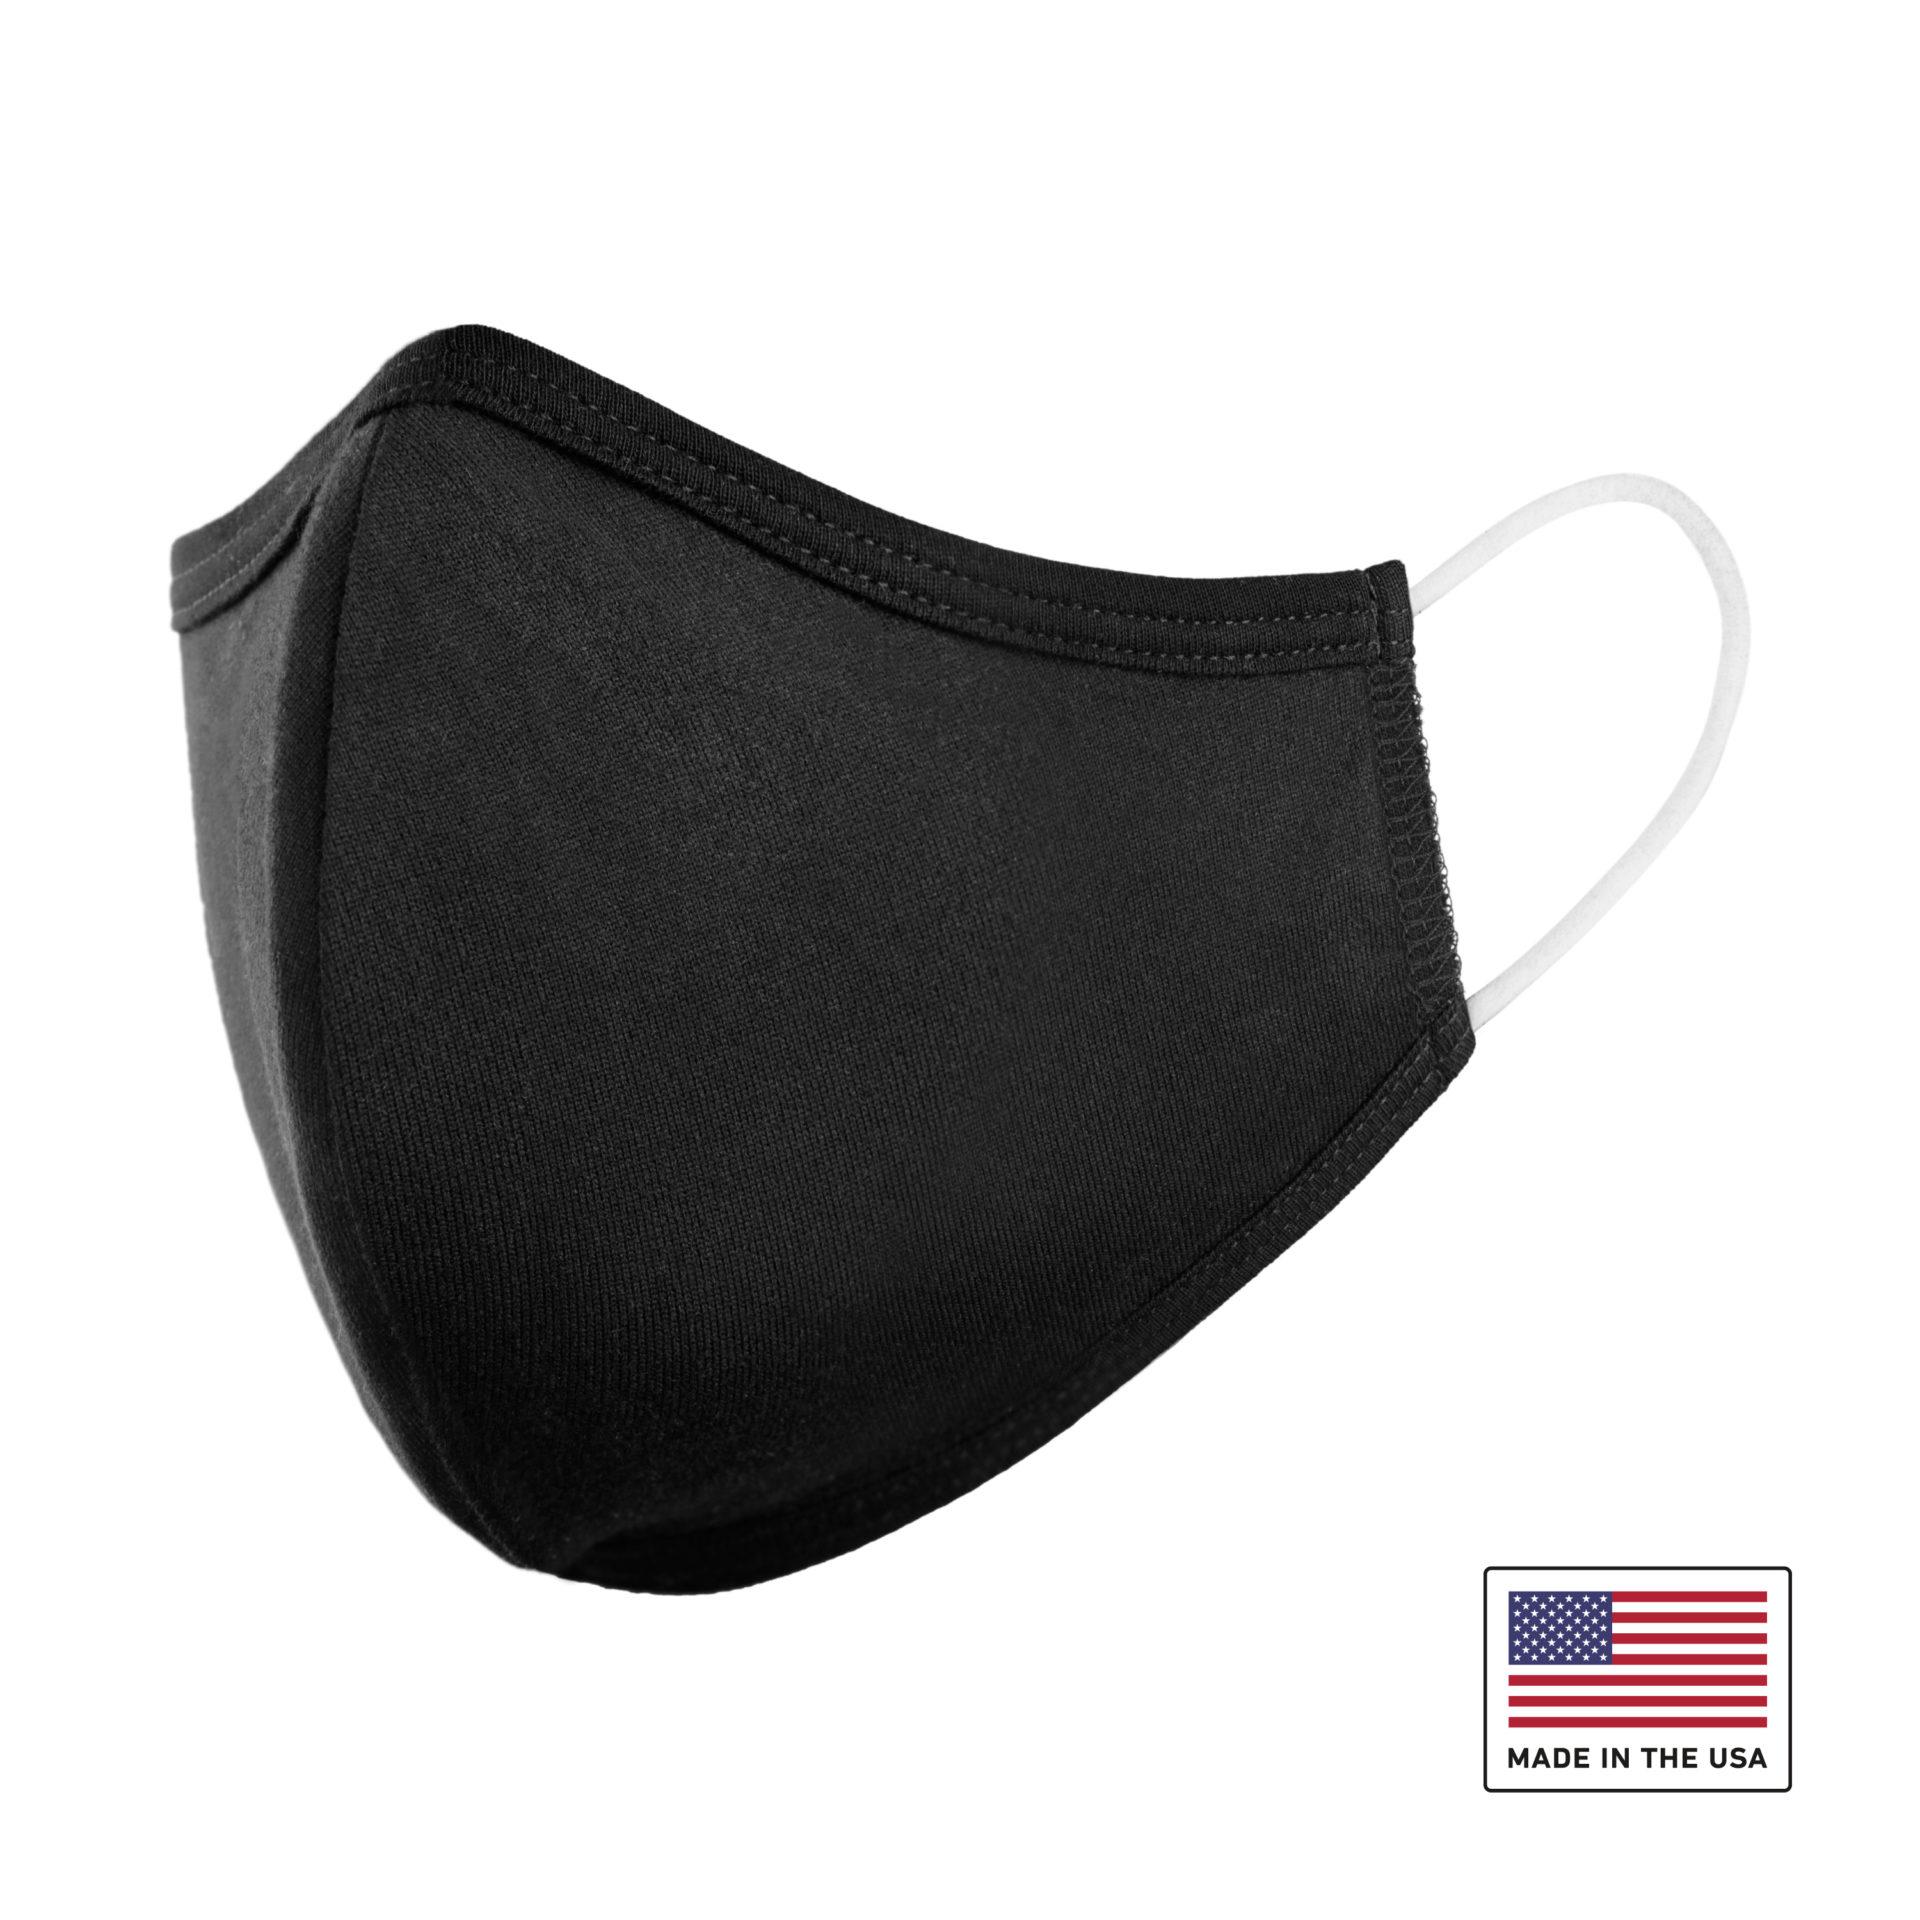 Washable Cloth Face Mask USA Made Black Fabric PPE